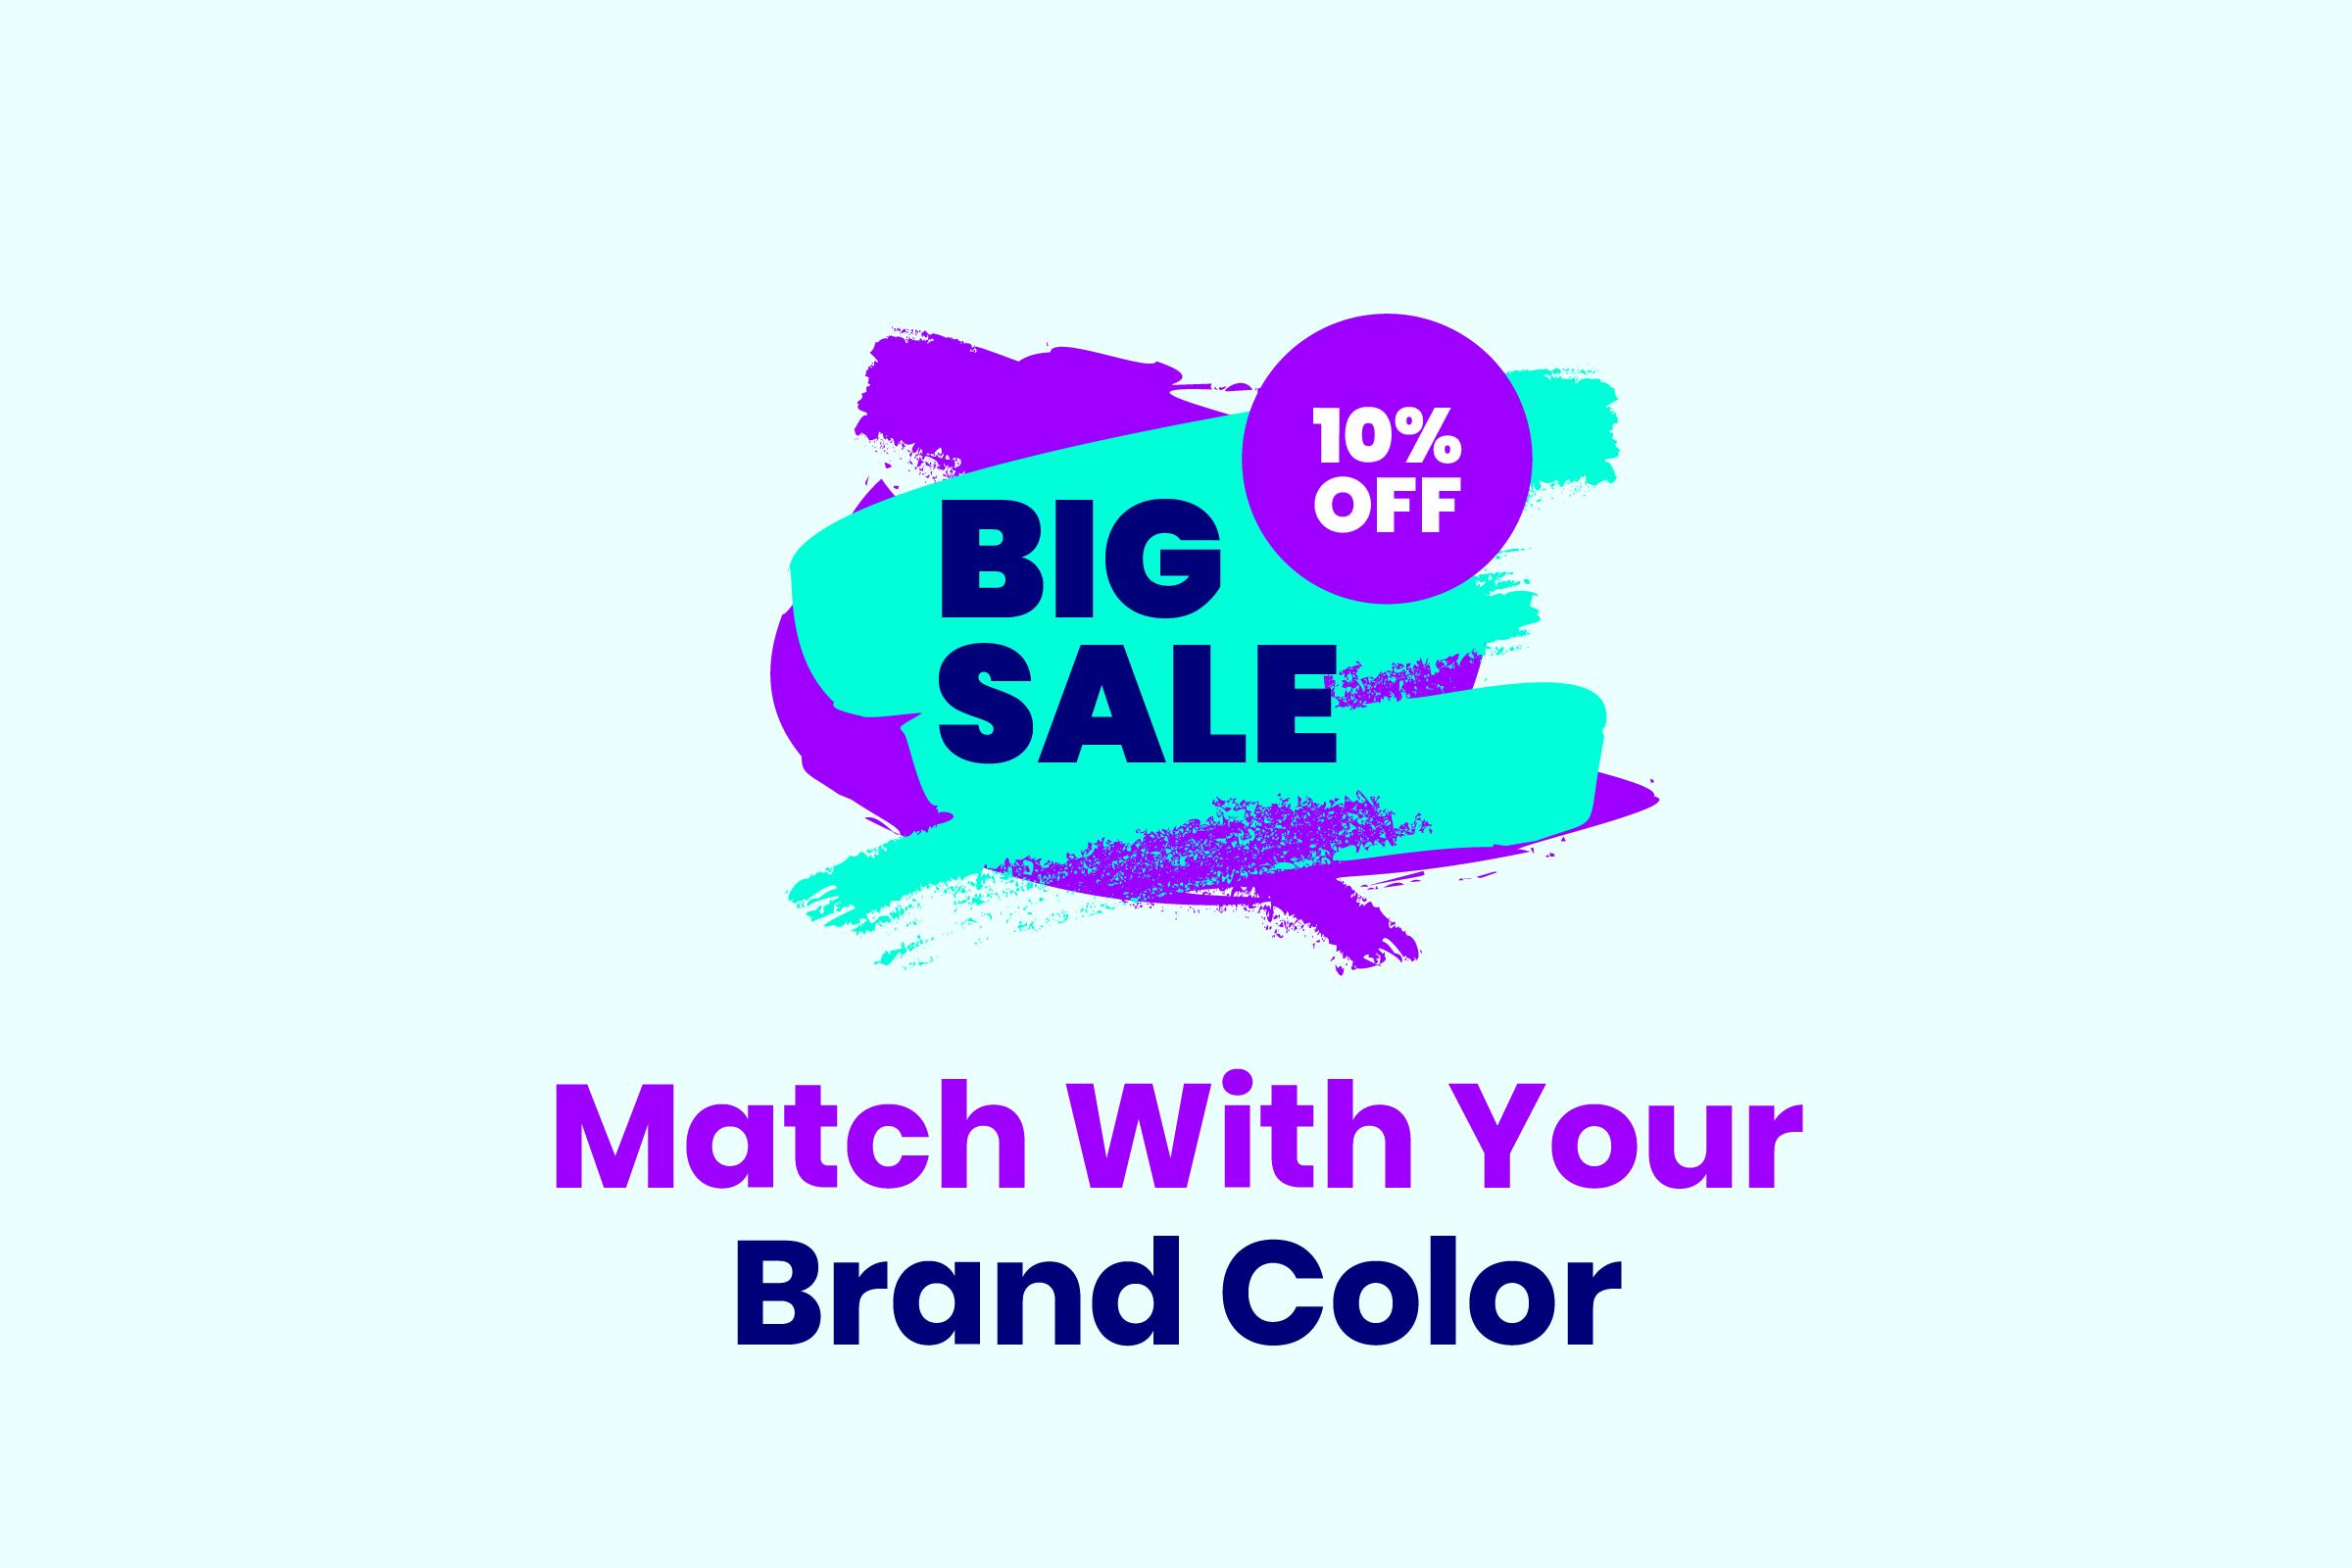 Modern Grunge Sale Price Marketing Graphics example image 3